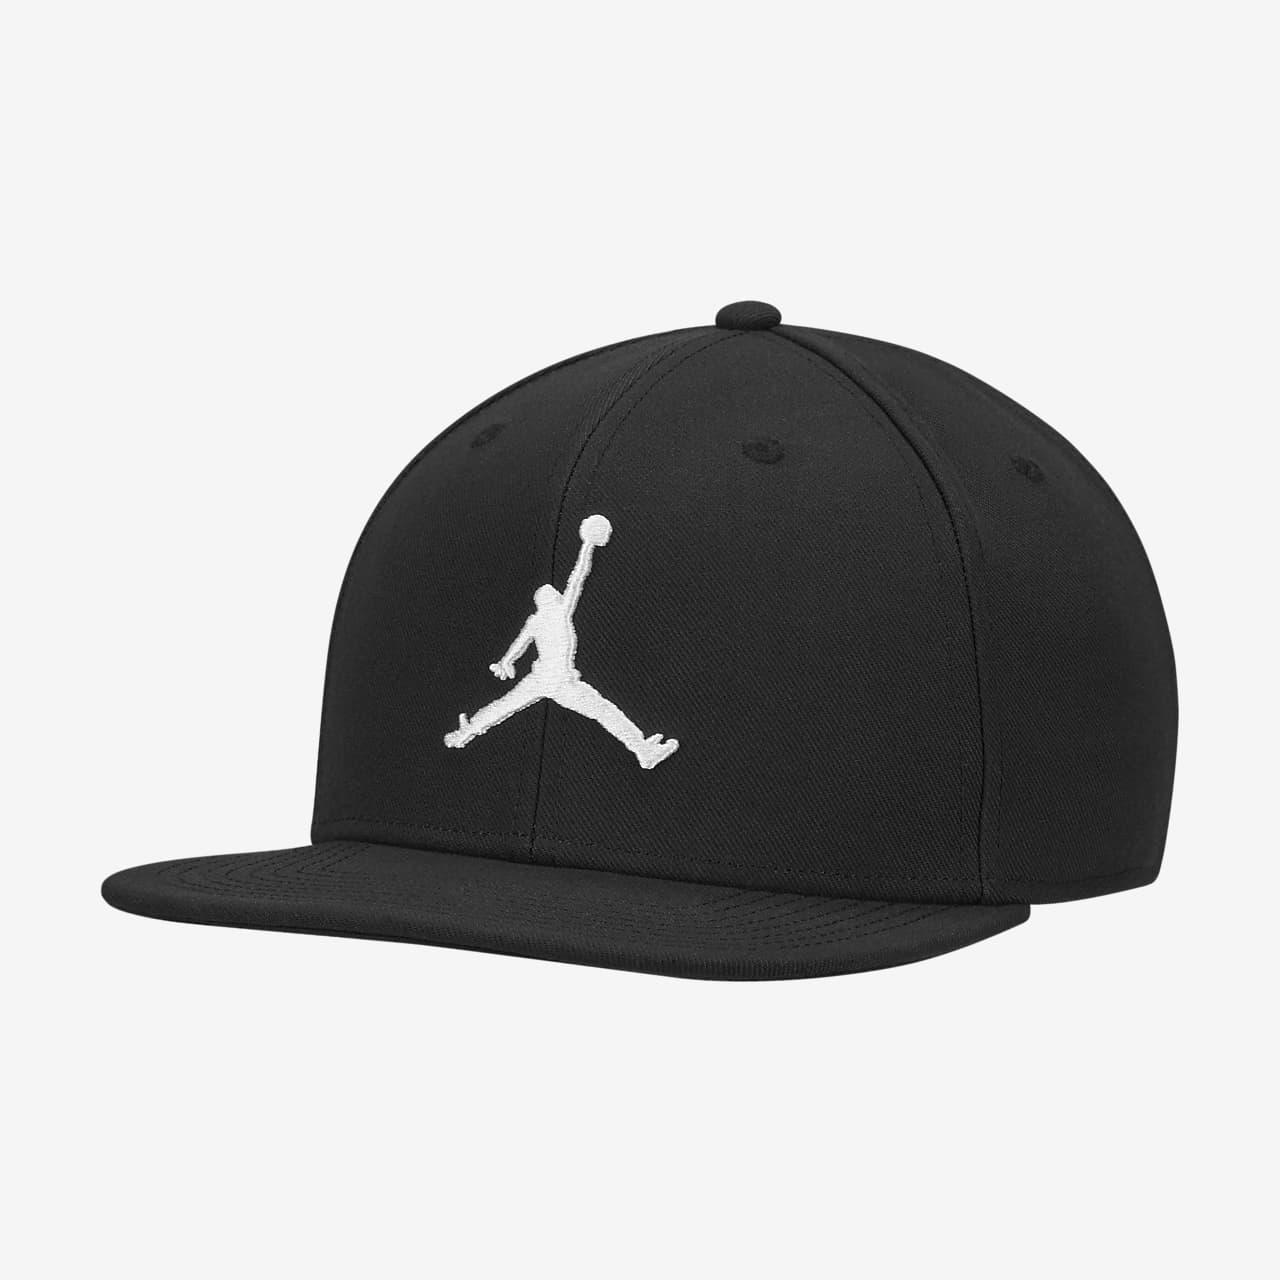 Jordan pro jumpman snapback gorra txlsfx jpg 1280x1280 Tenis jordan gorras  en venta 7737cb87b9e